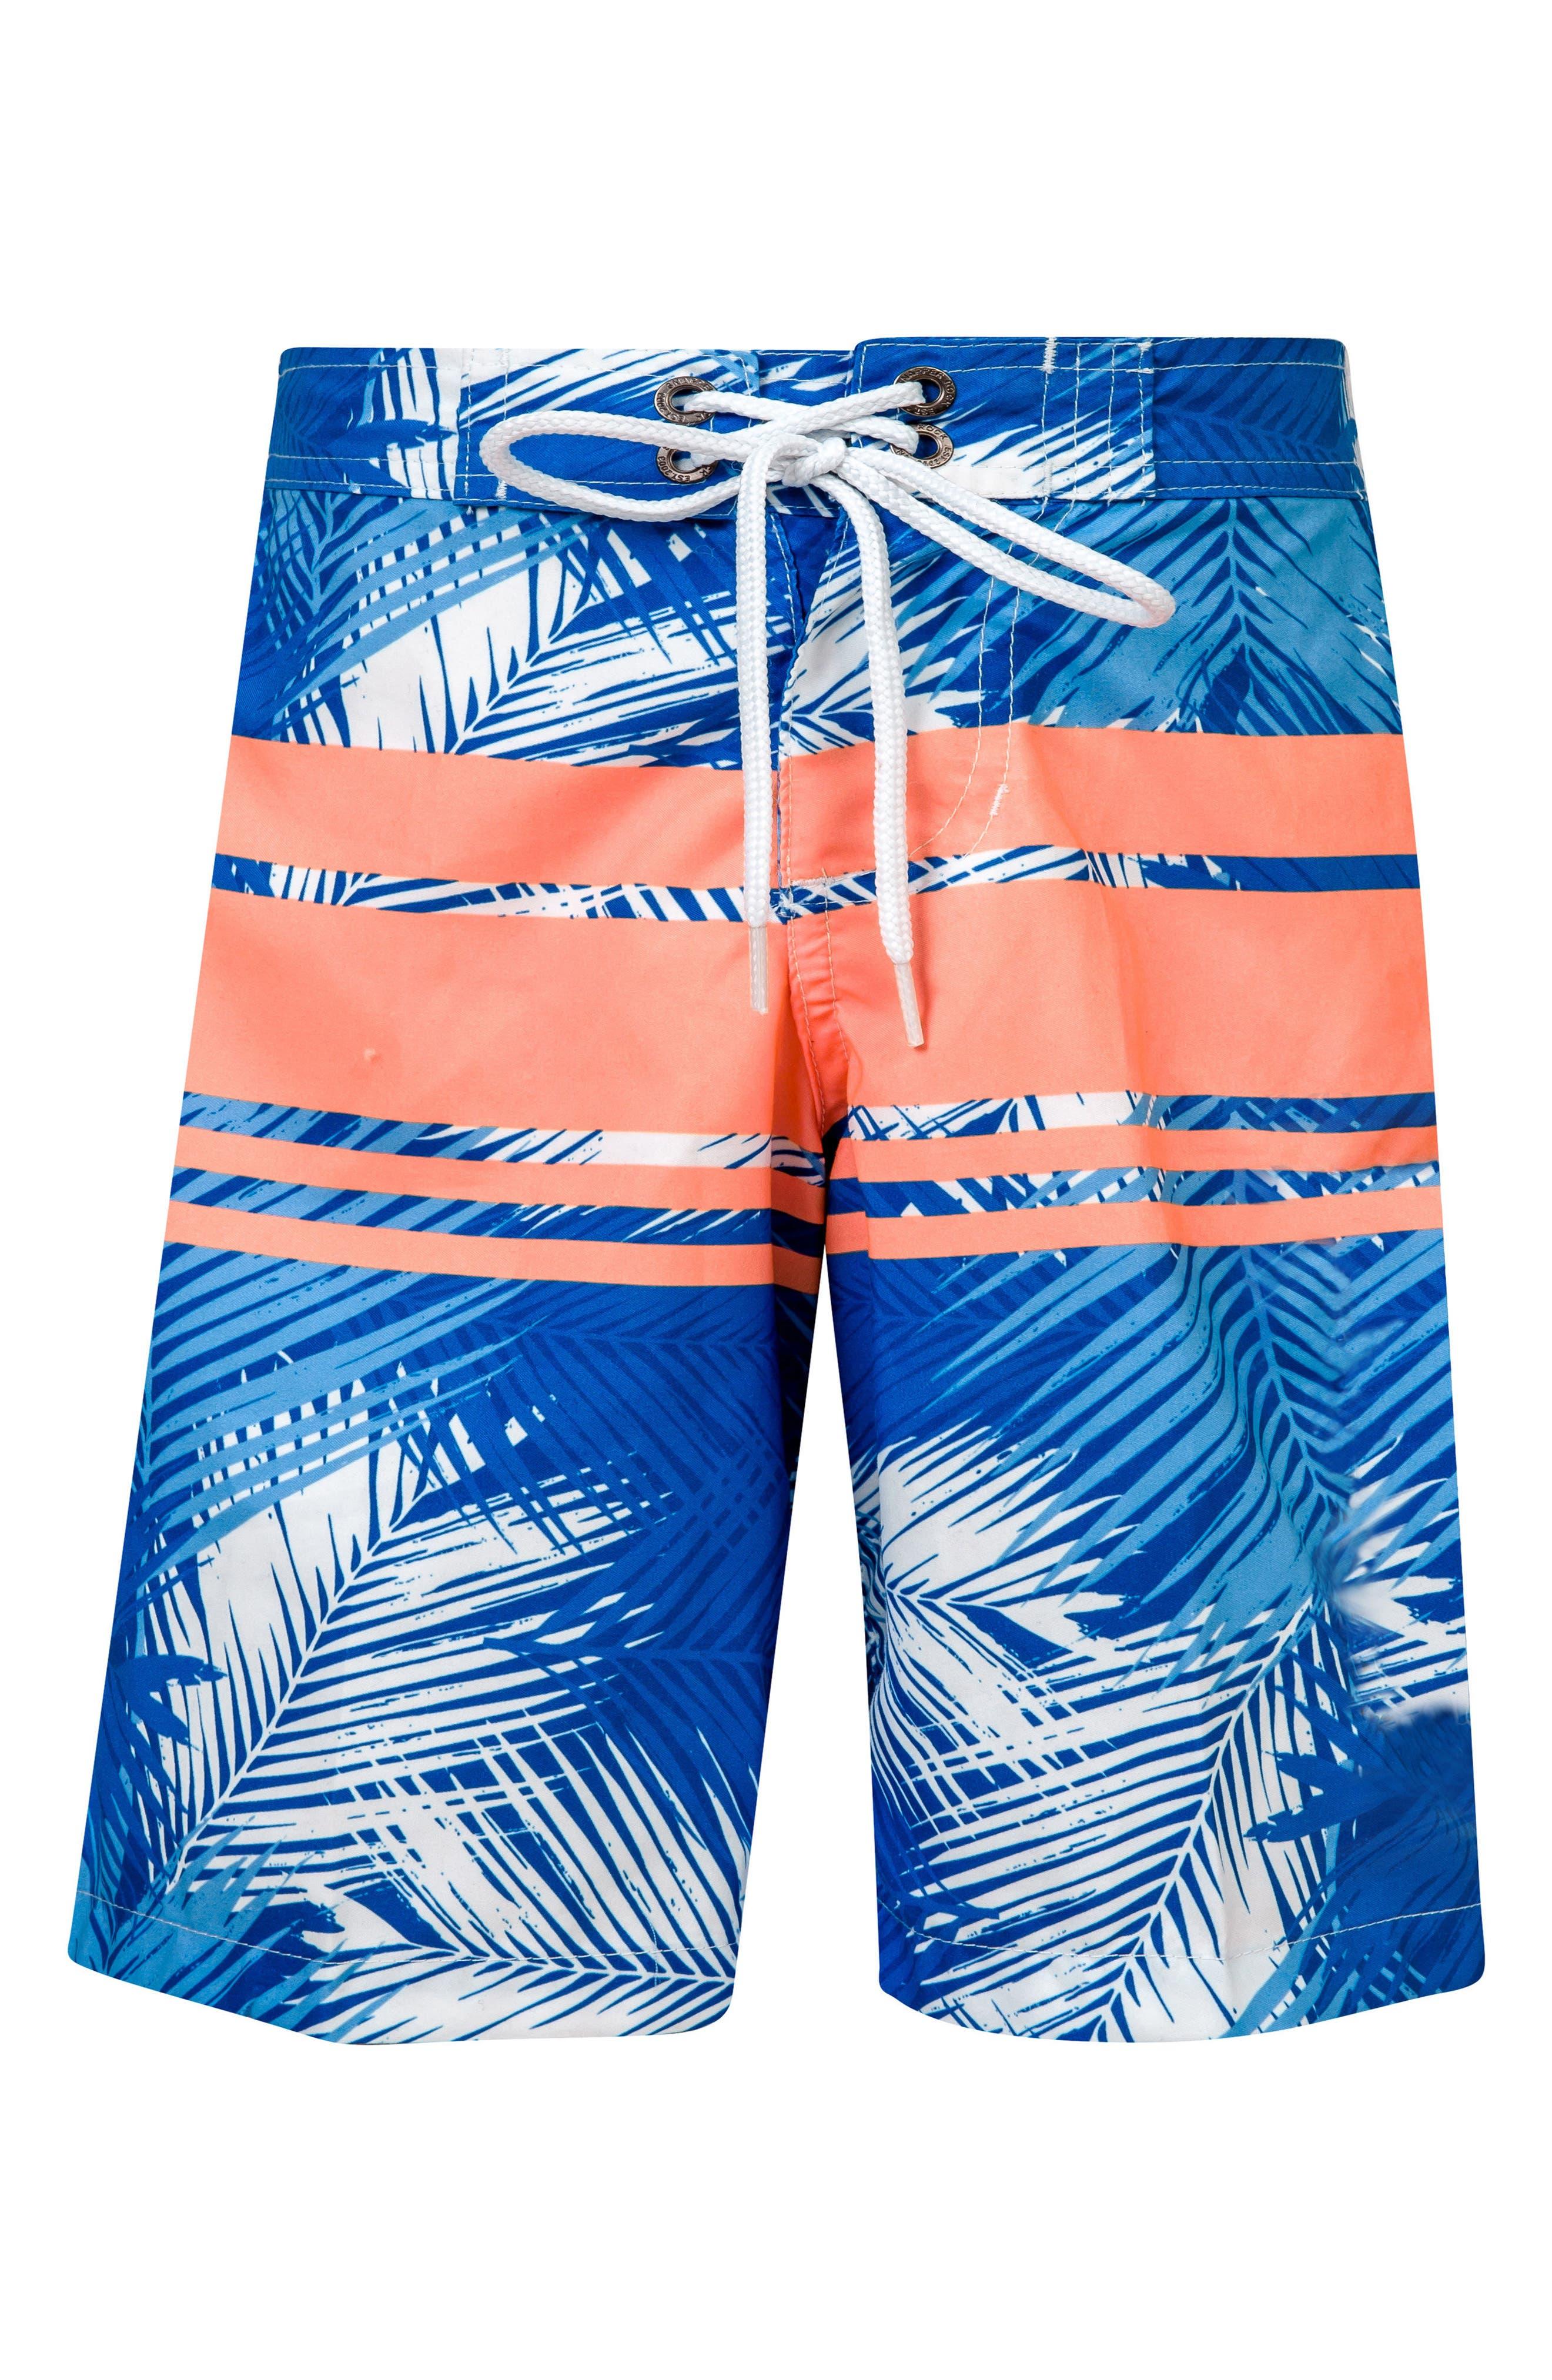 Tropical Neon Stripe Board Shorts,                         Main,                         color, Royal/ Neon Coral/ White